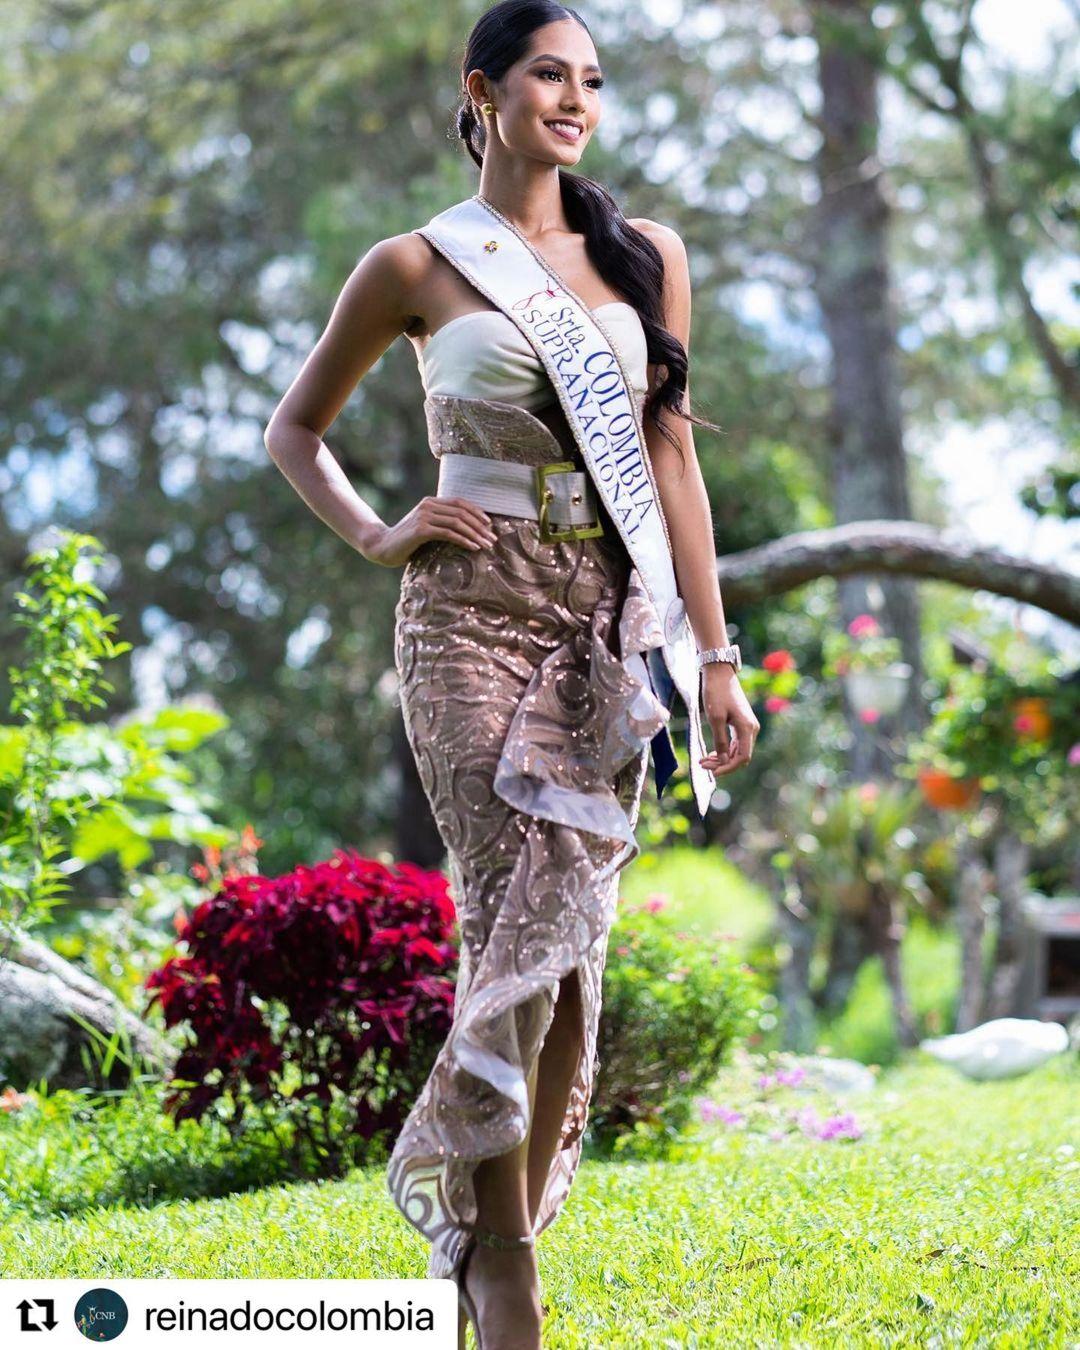 valentina aldana, miss supranational colombia 2021. 22765616